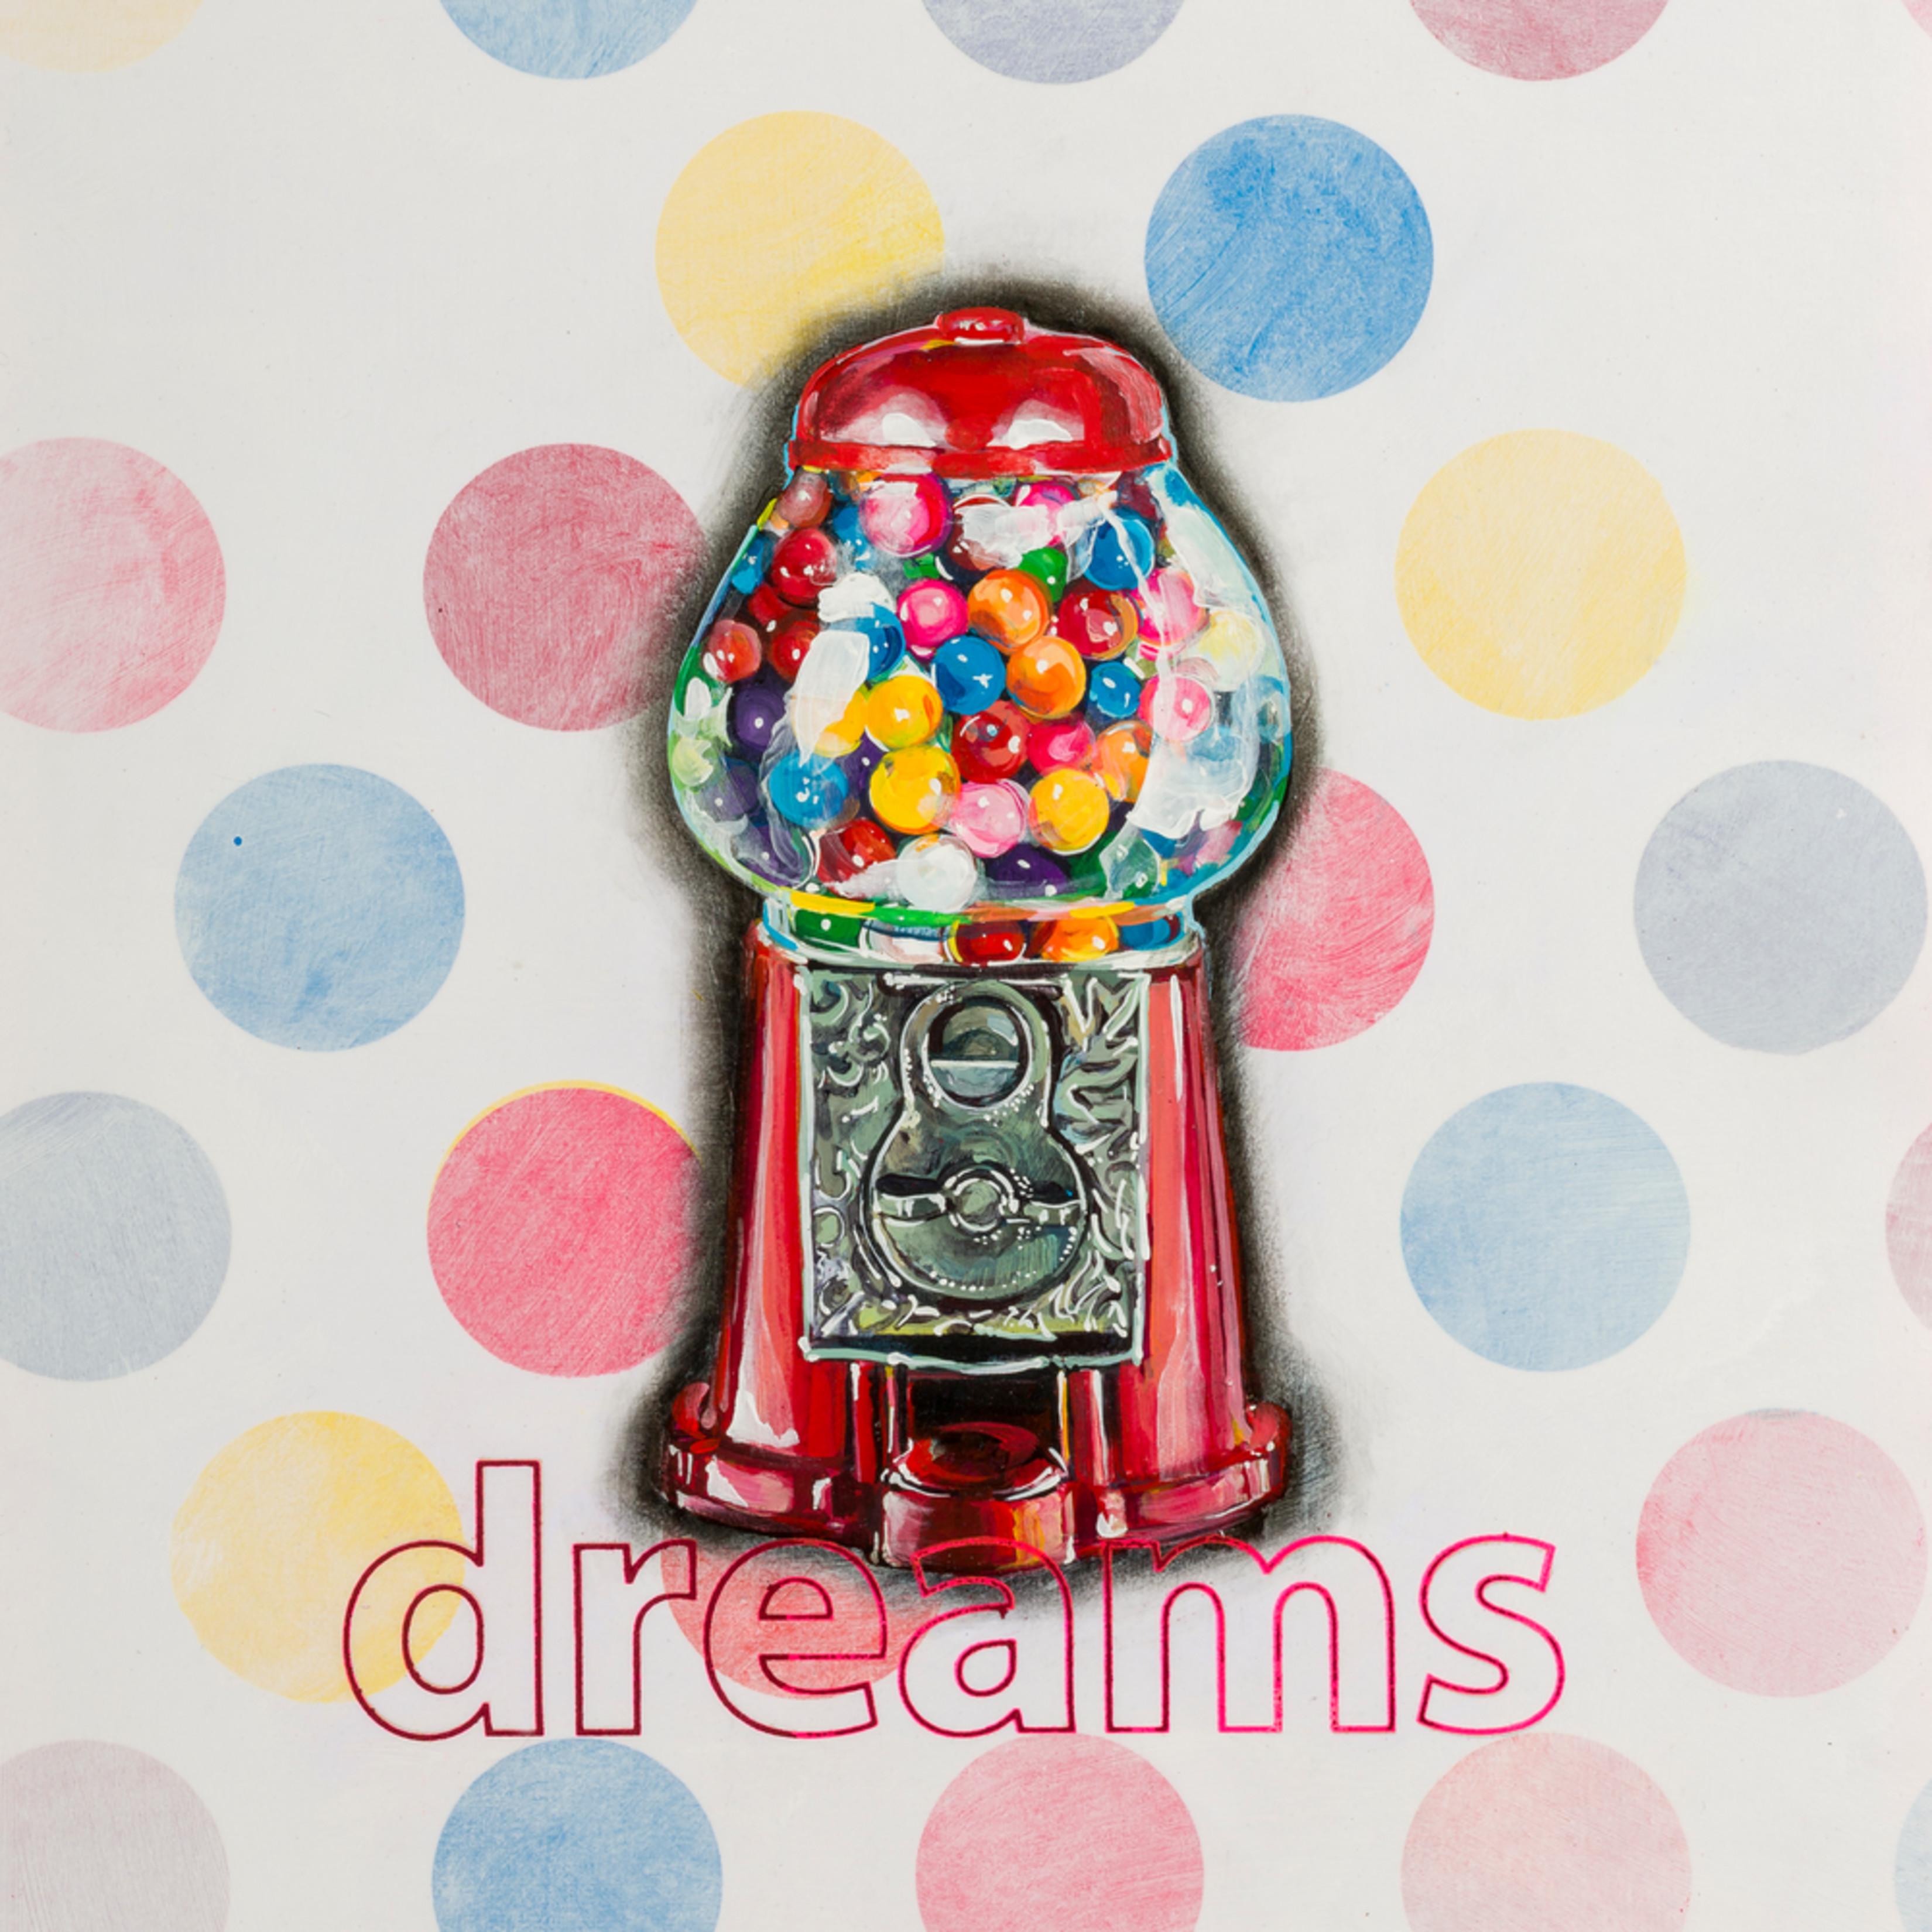 Bubblegum dreams tm9uwb